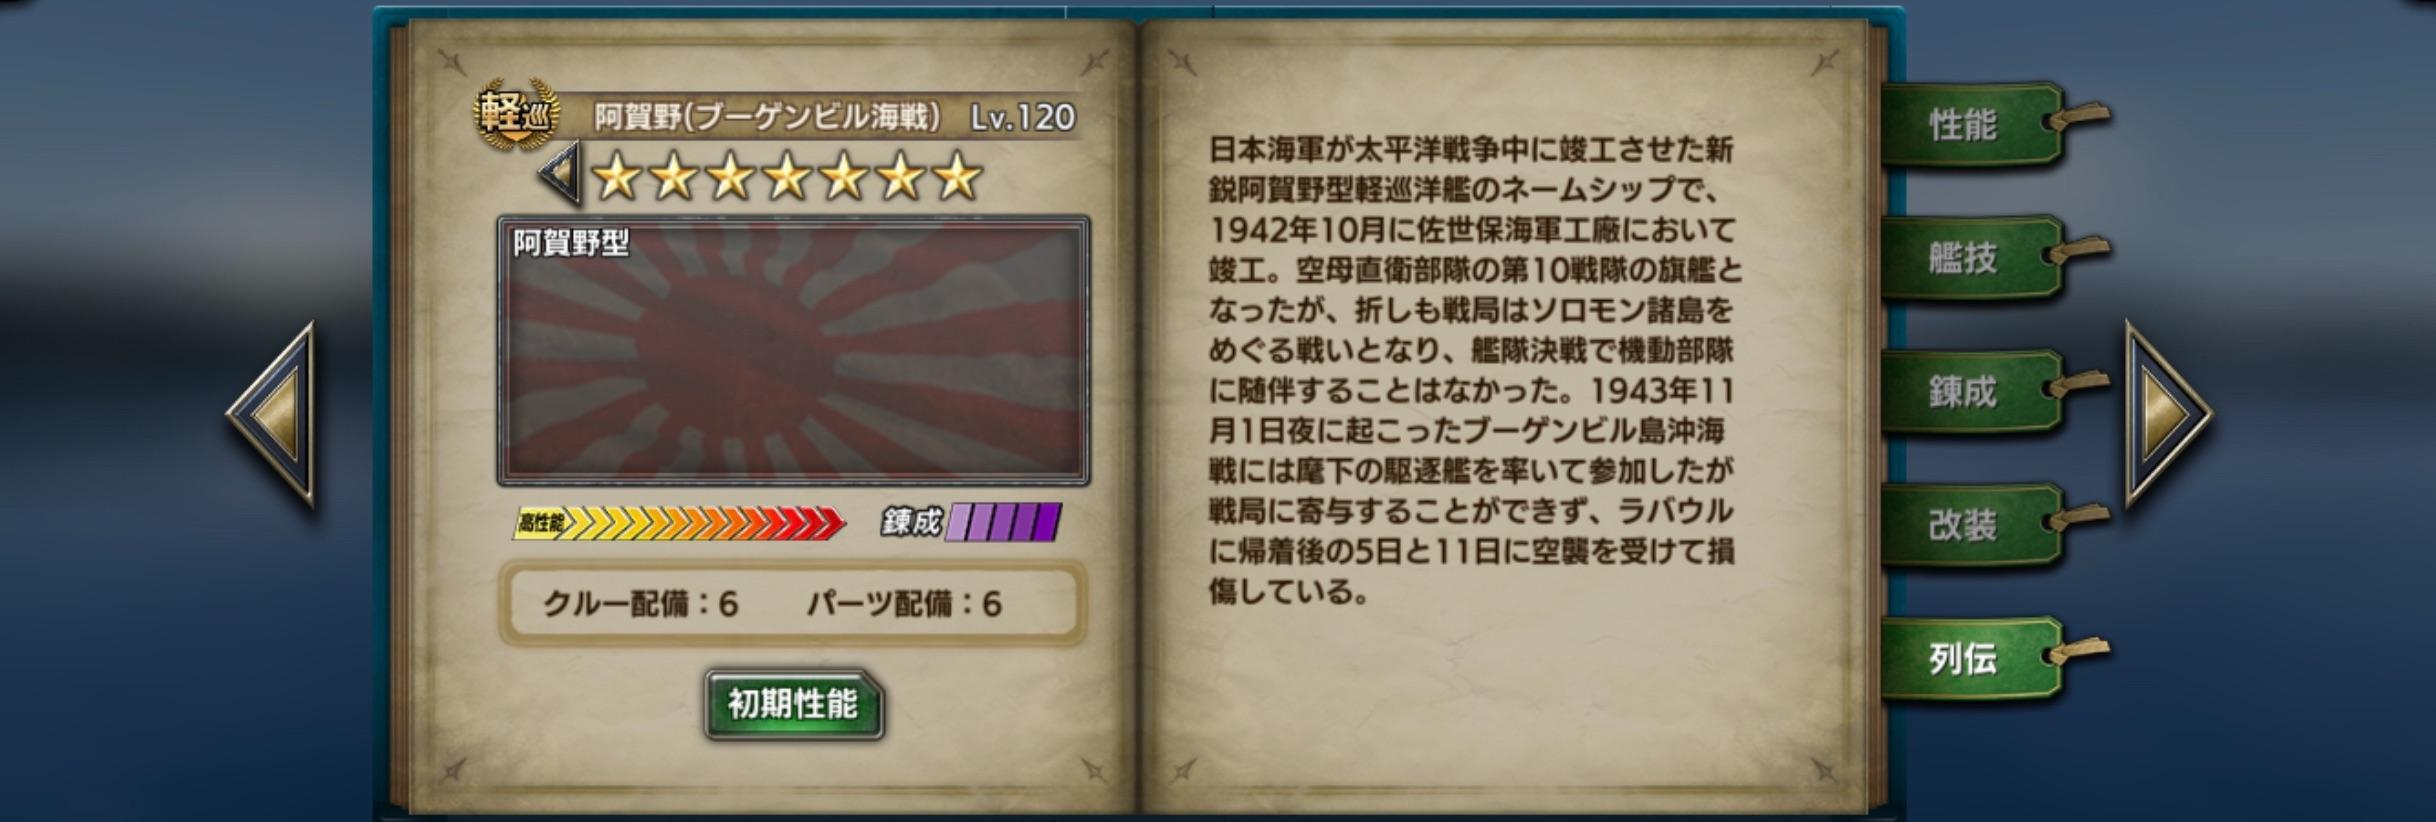 agano-history